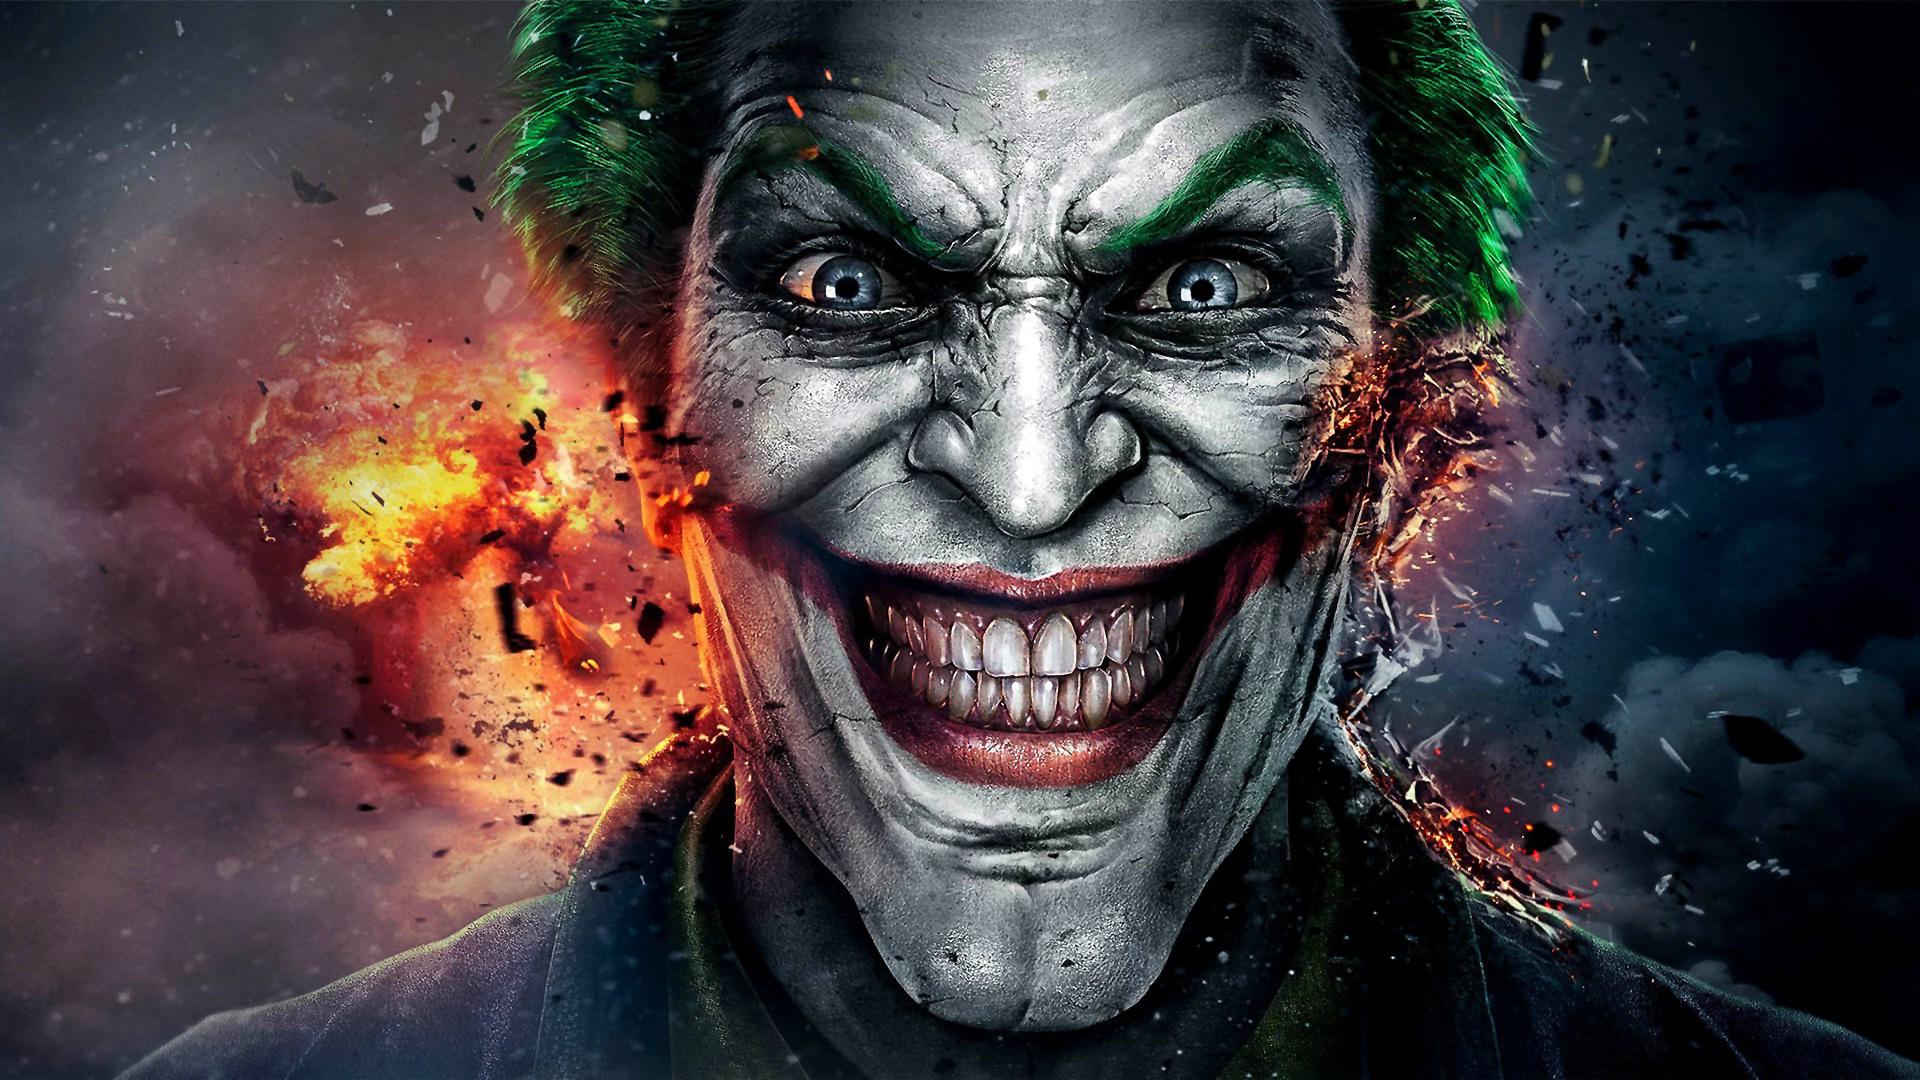 The Joker Desktop Wallpaper Posted By Zoey Johnson